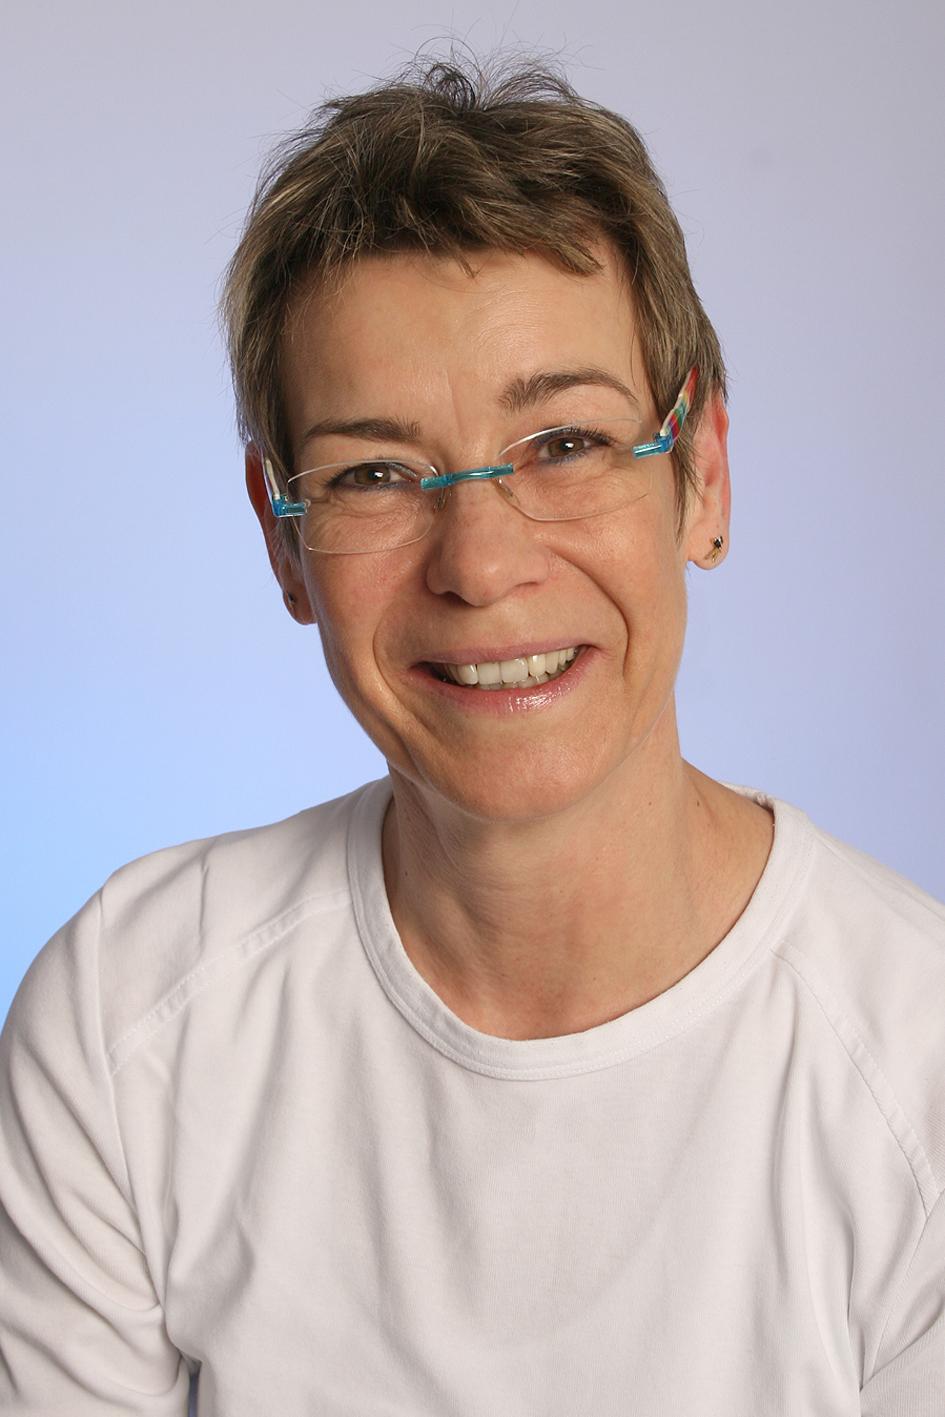 Andrea Schröter-Ulbrich